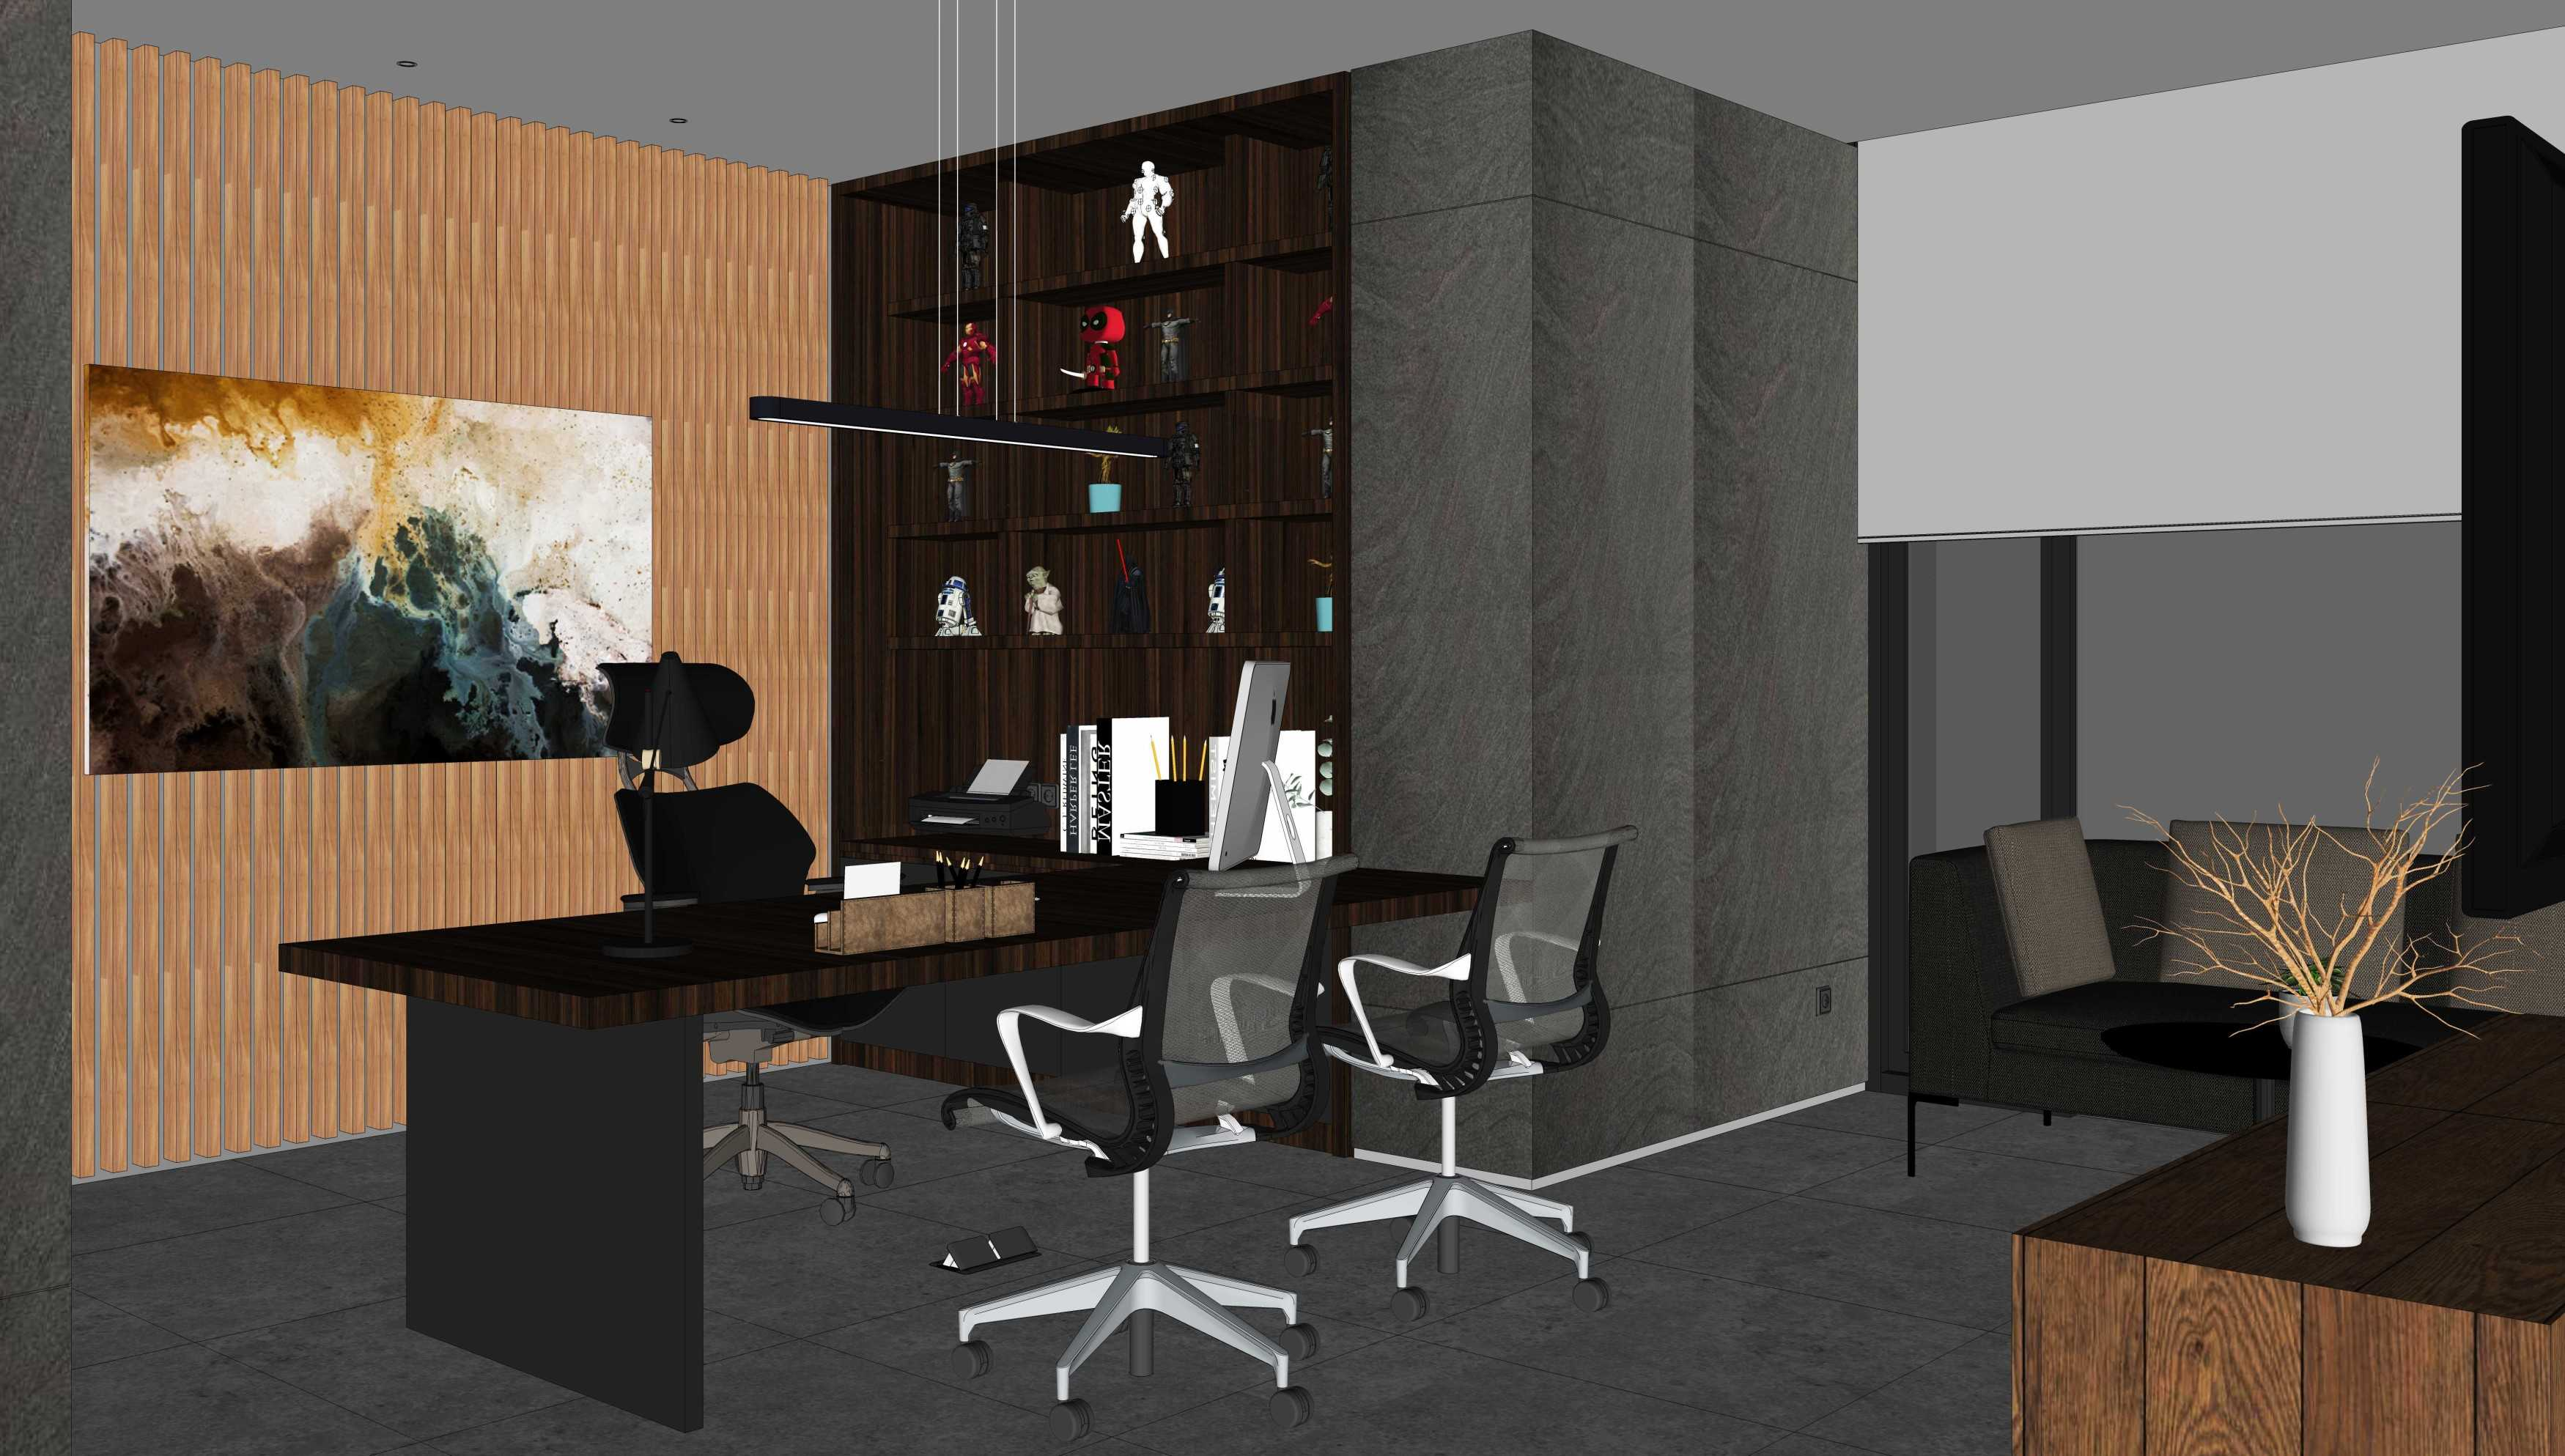 Pt. Modula Adeha Office Jakarta, Daerah Khusus Ibukota Jakarta, Indonesia Jakarta, Daerah Khusus Ibukota Jakarta, Indonesia Pt-Modula-Adeha-Office   92090